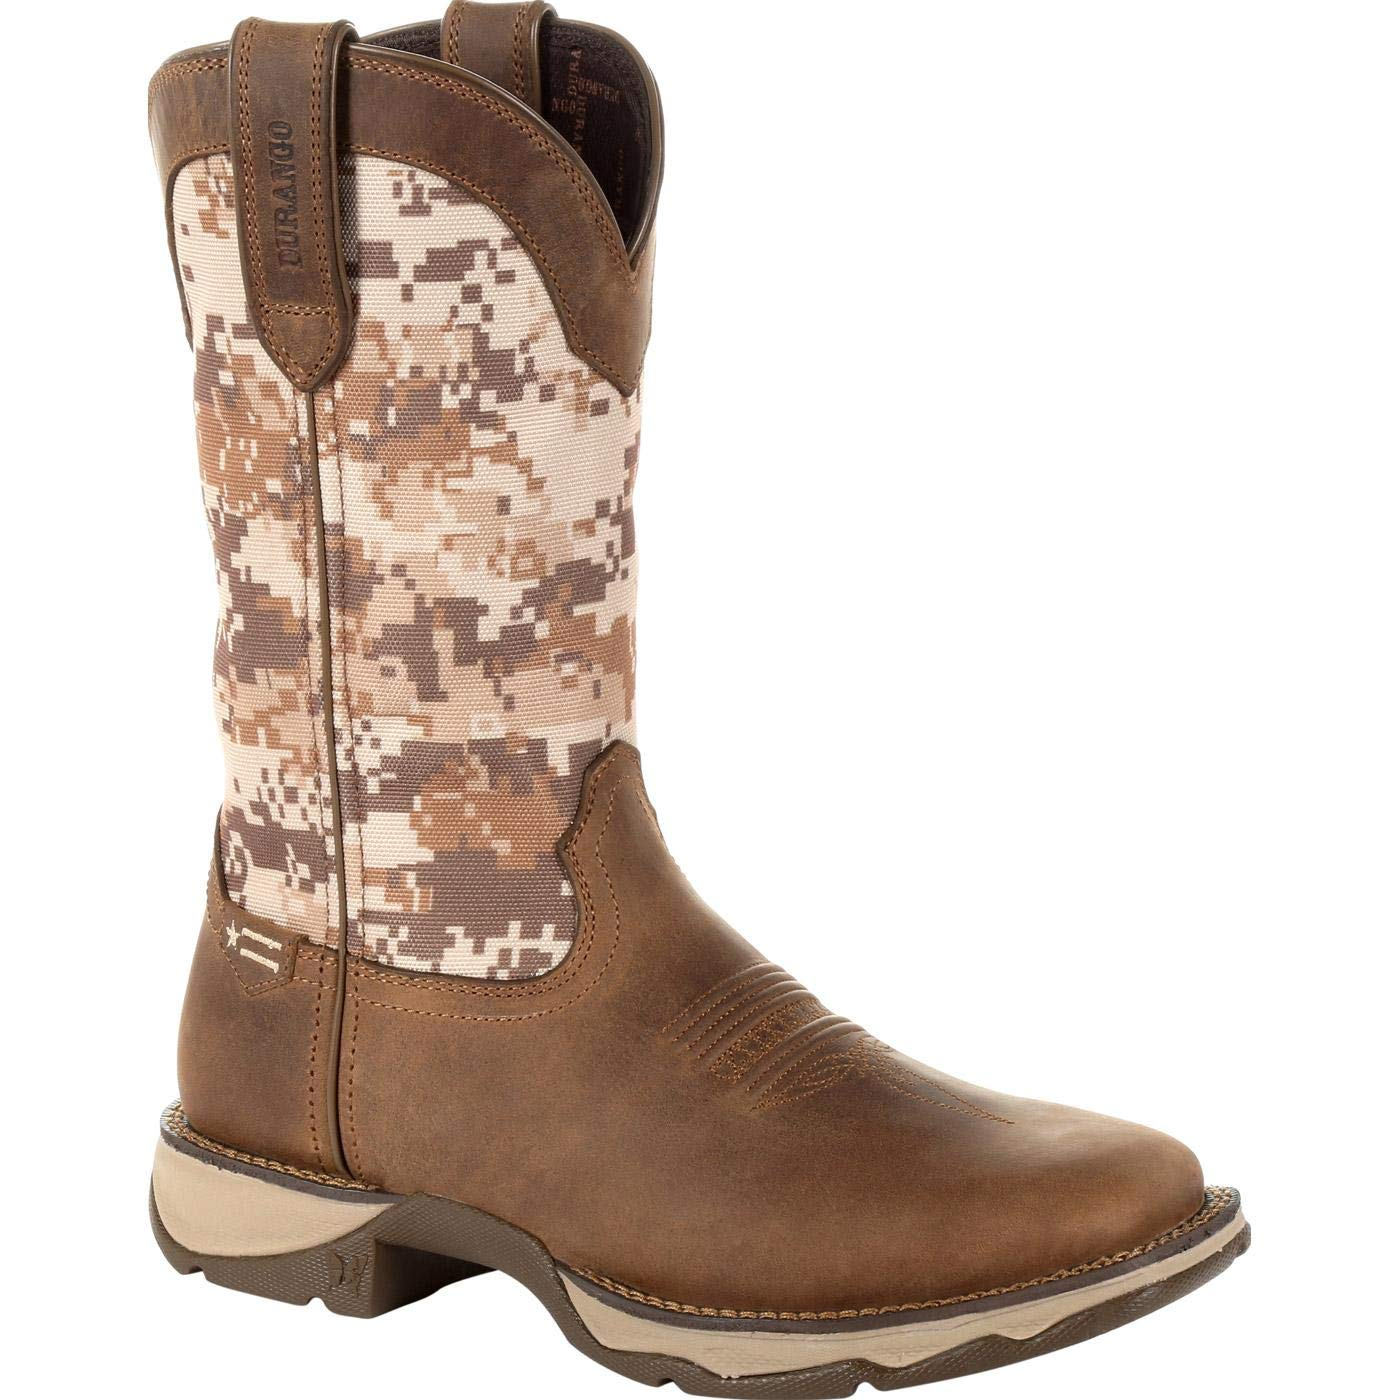 Durango Lady Rebel Women's Desert Camo Western Boot Mid Calf, Dusty Brown, 11 M US by Durango